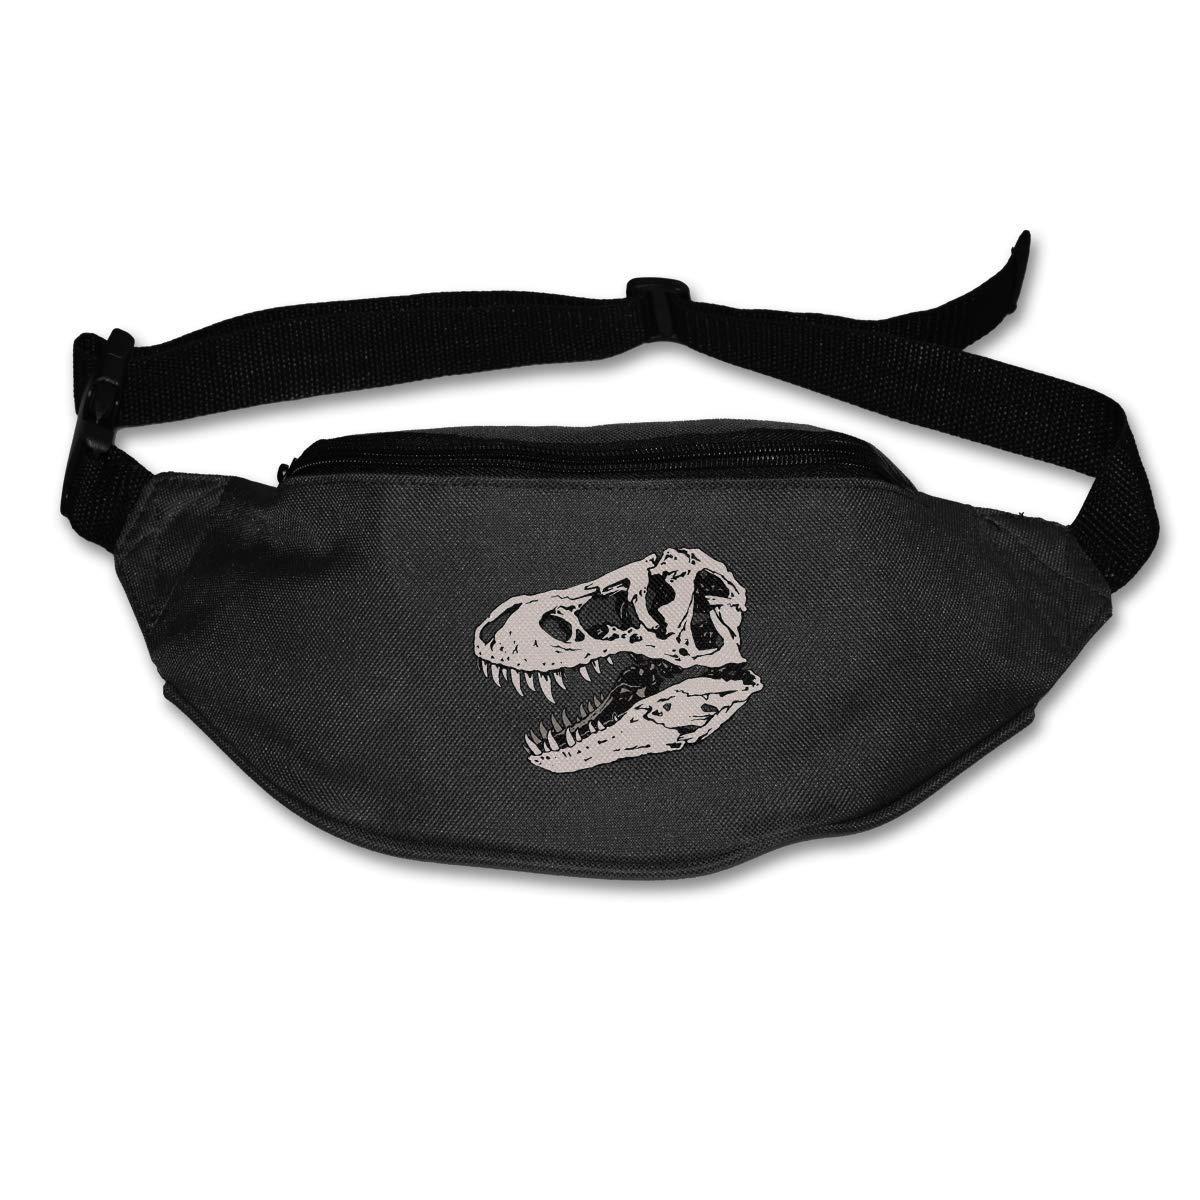 xjh558798 Tyrannosaurus Rex Skull Running orts Waist Bag Zipper Pockets Water